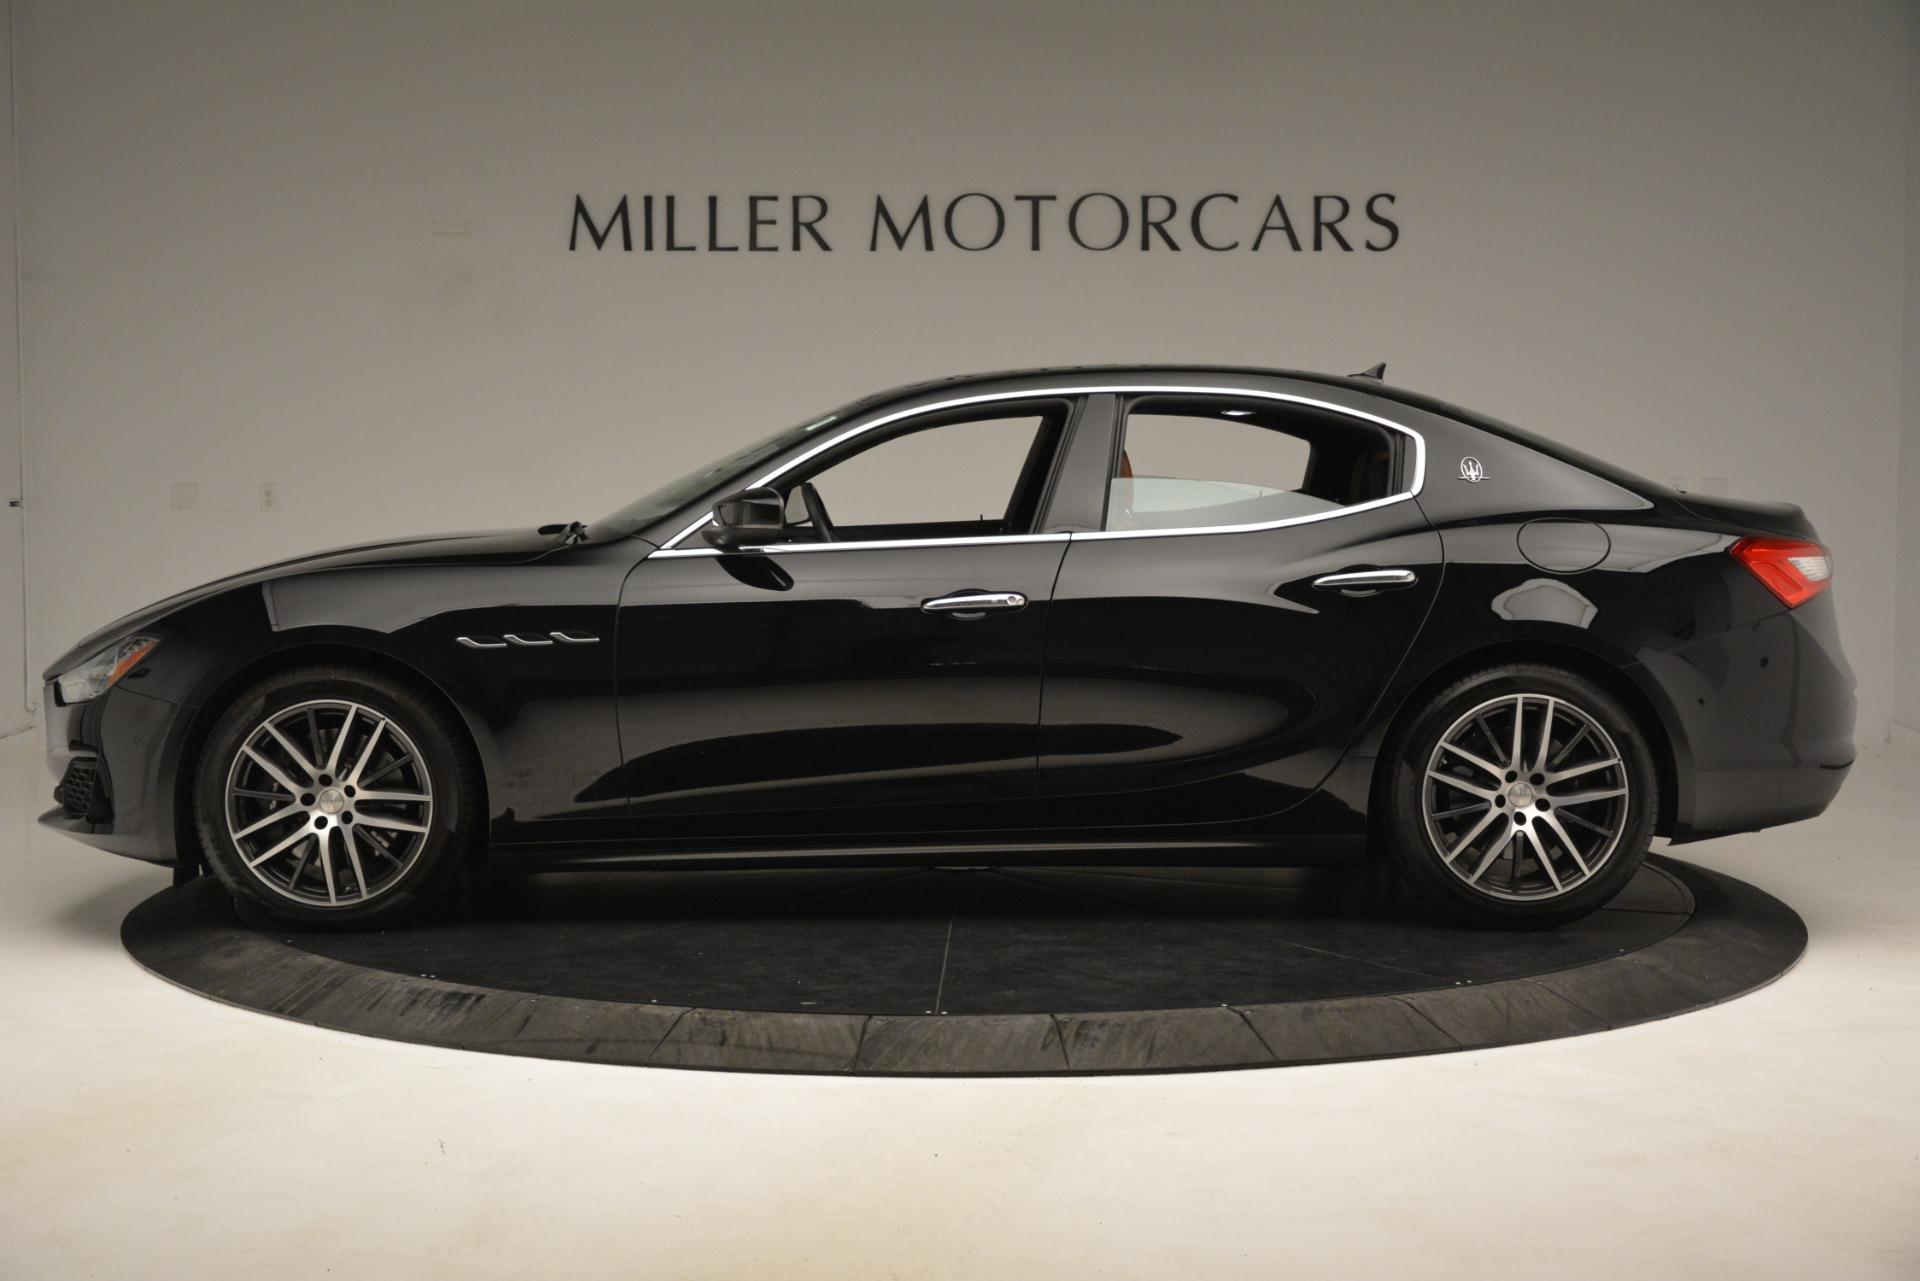 New 2019 Maserati Ghibli S Q4 For Sale In Westport, CT 2793_p3